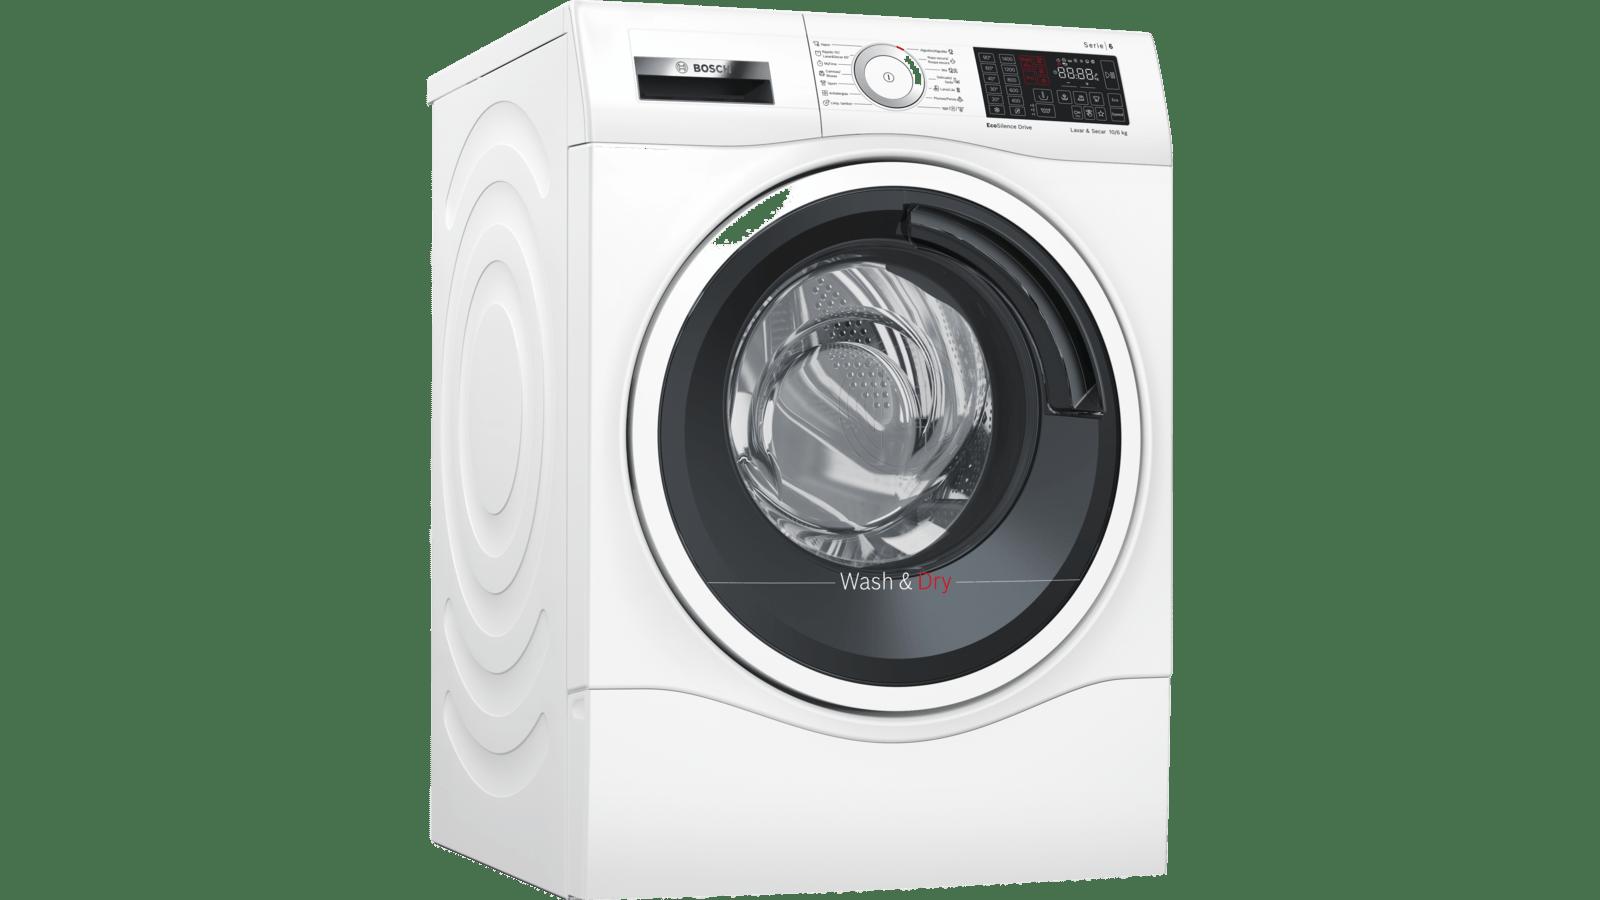 Waschmaschinenbezug 60x60cm secadora referencia ya referencia waschmaschinenschoner referencia